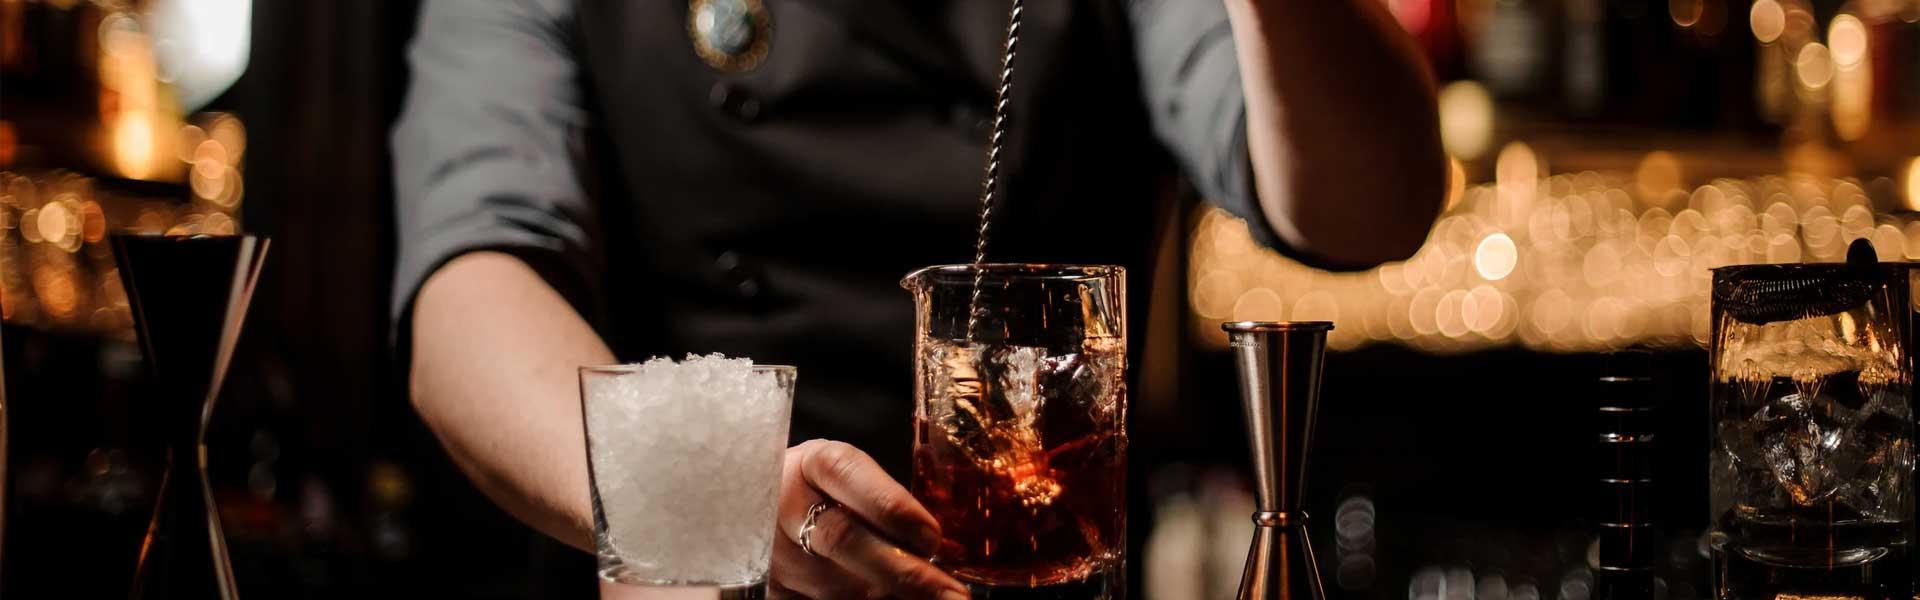 Growthdeck: Soho Street Cocktails